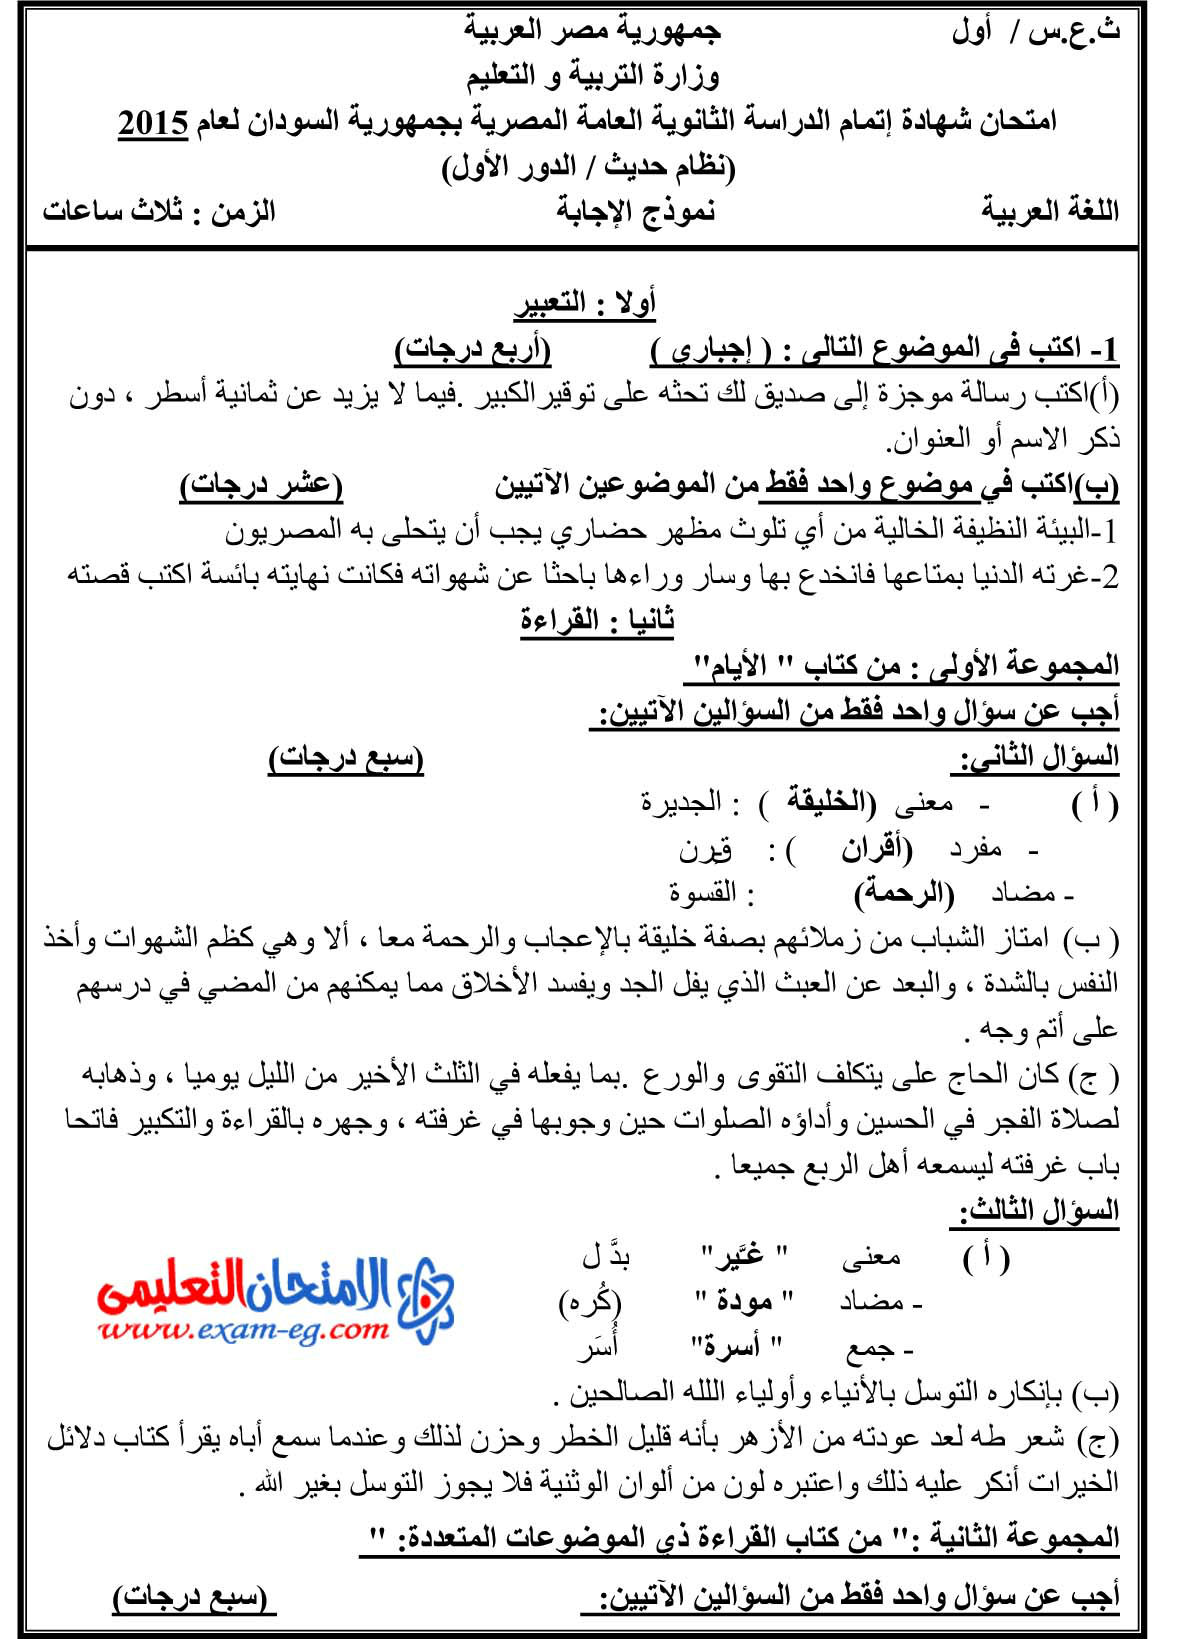 exam-eg.com_1429231820955.jpg